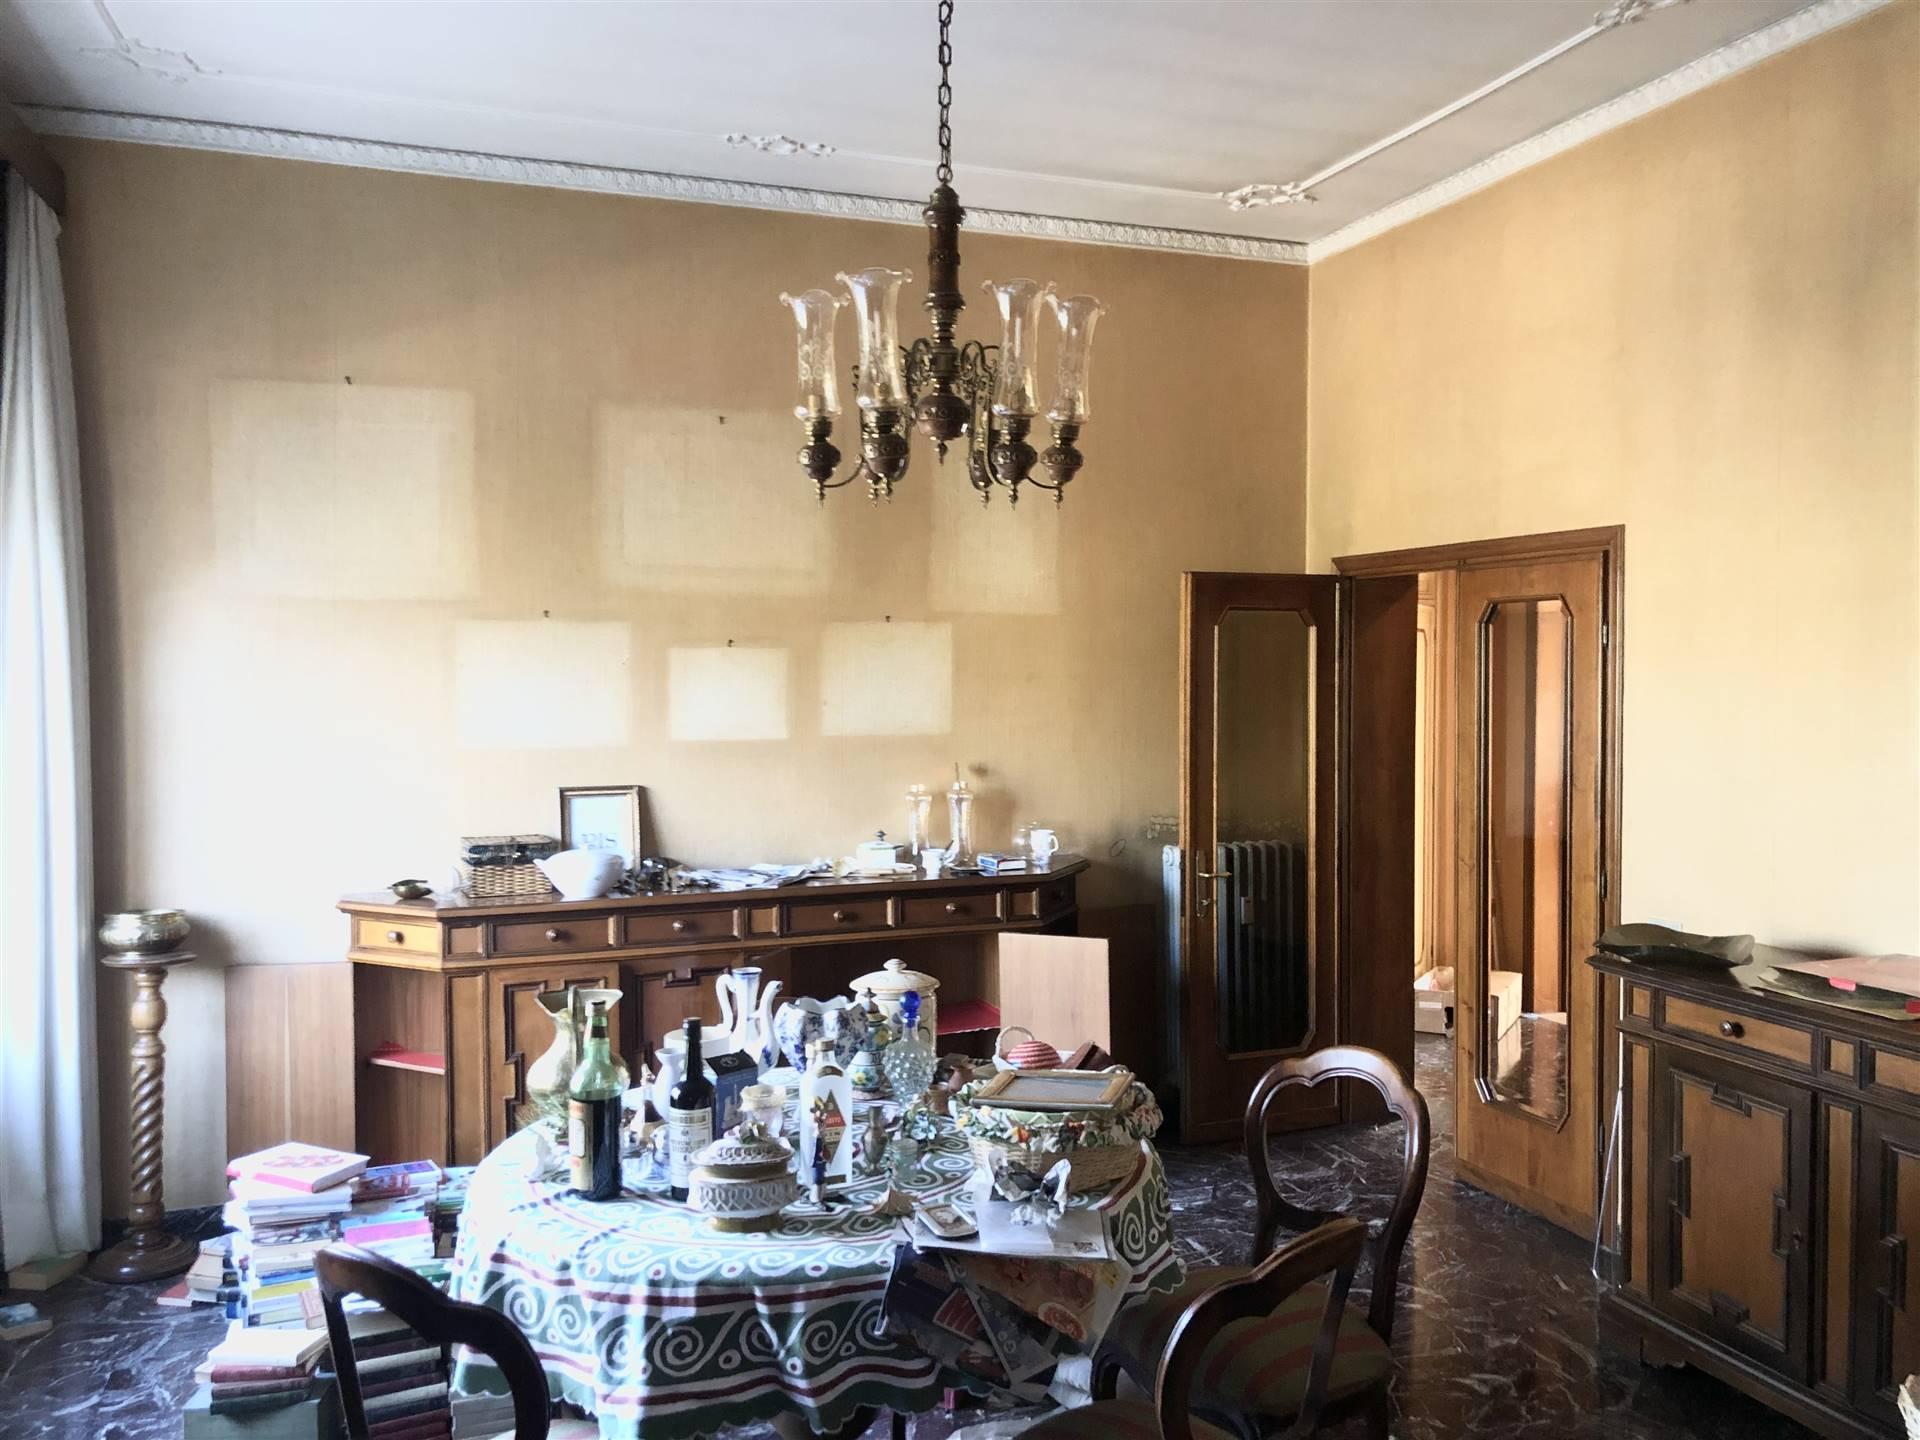 Appartamento Firenze Vendita 355 000 00 Zona 7 Pisana Soffiano Portaleagenzieimmobiliari It